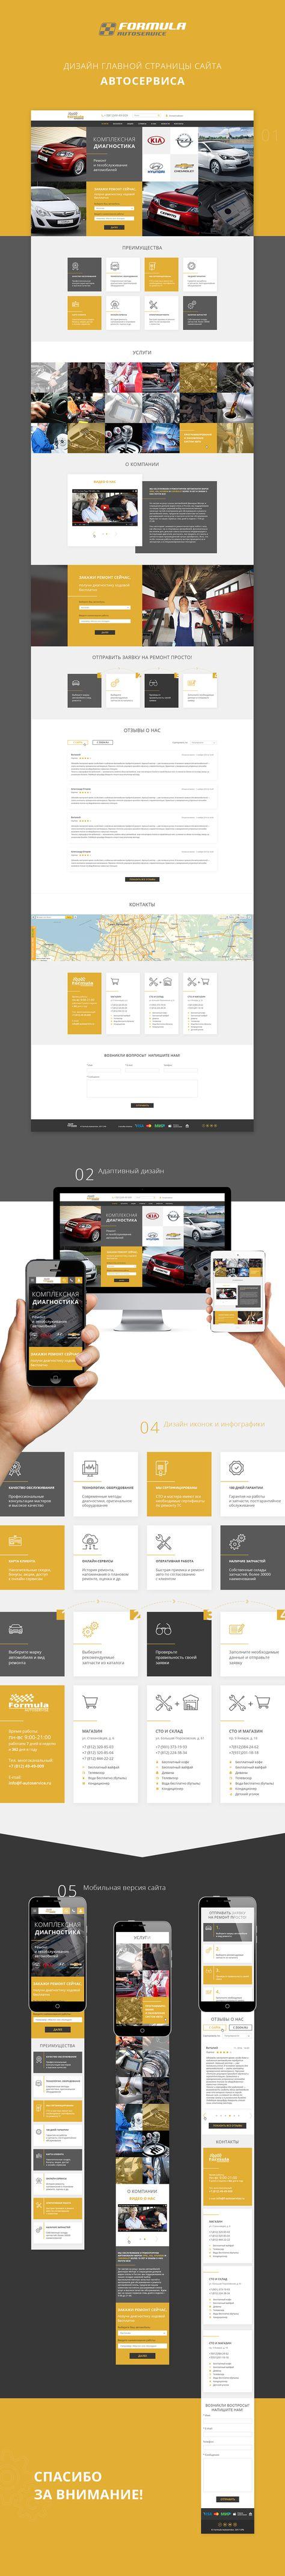 Design of the site for Formula